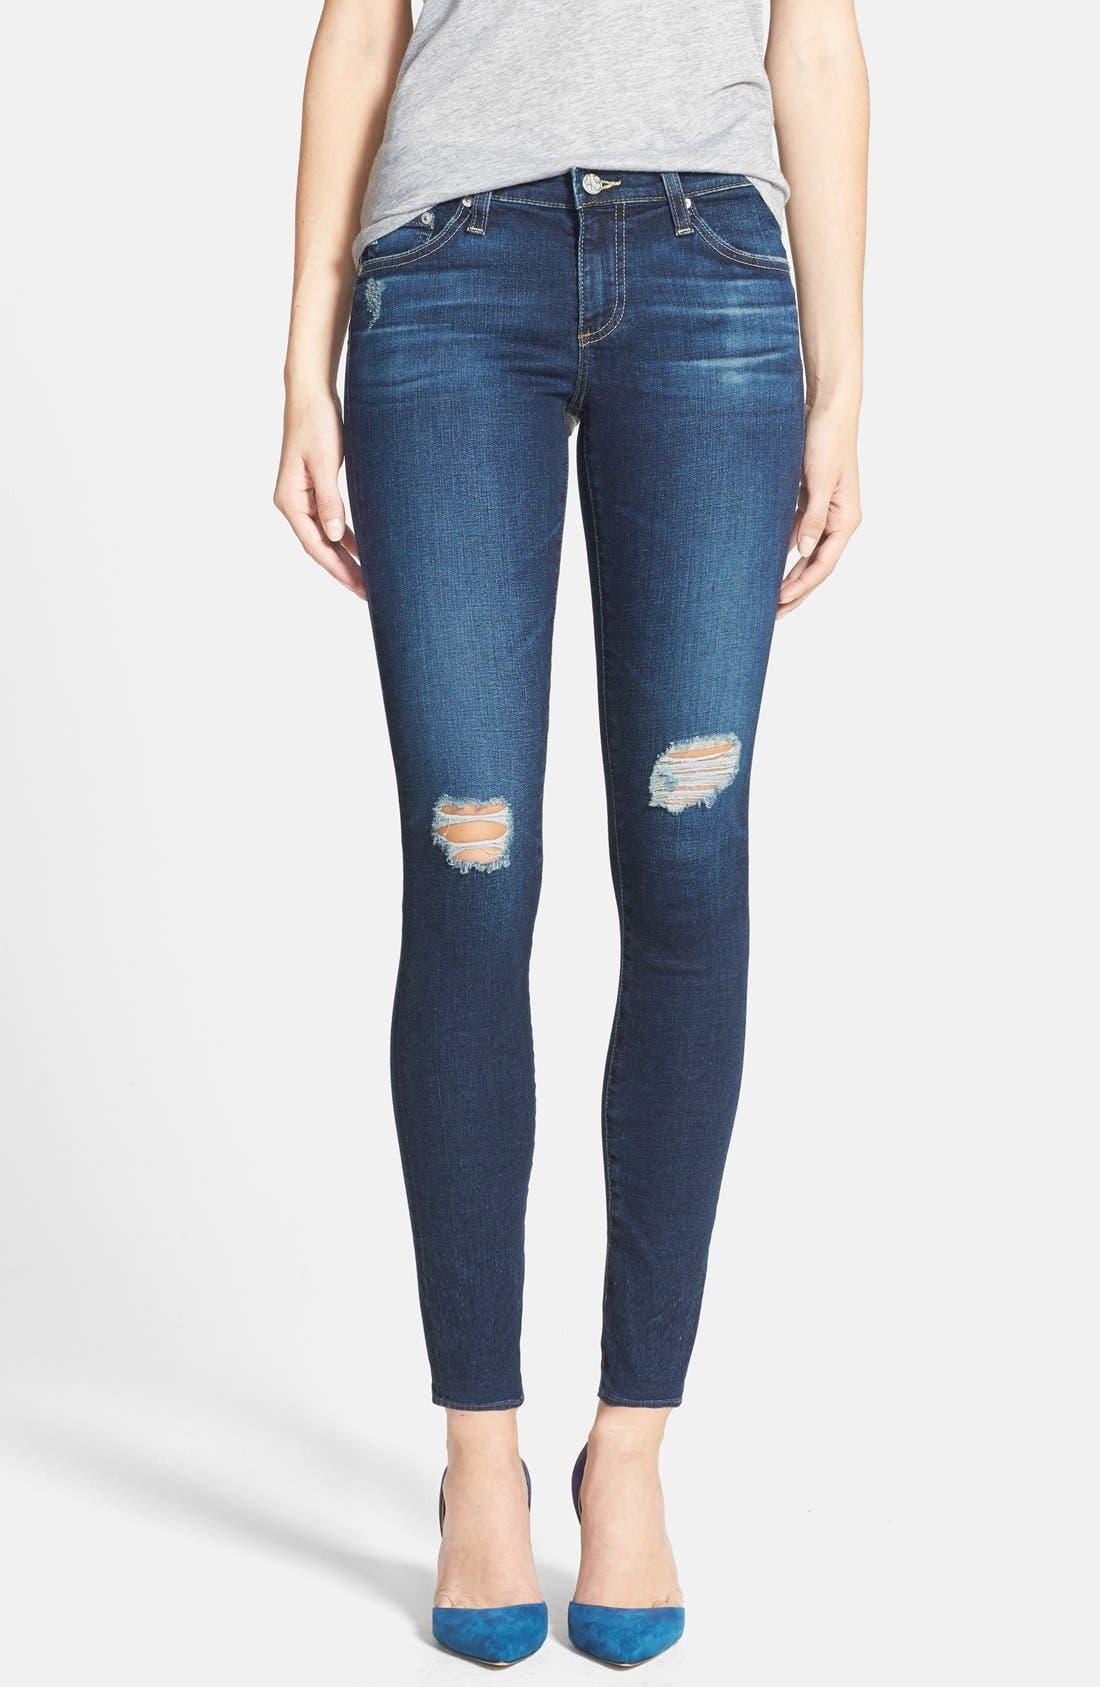 Main Image - AG 'The Legging' Ankle Jeans (4 Year Fog)